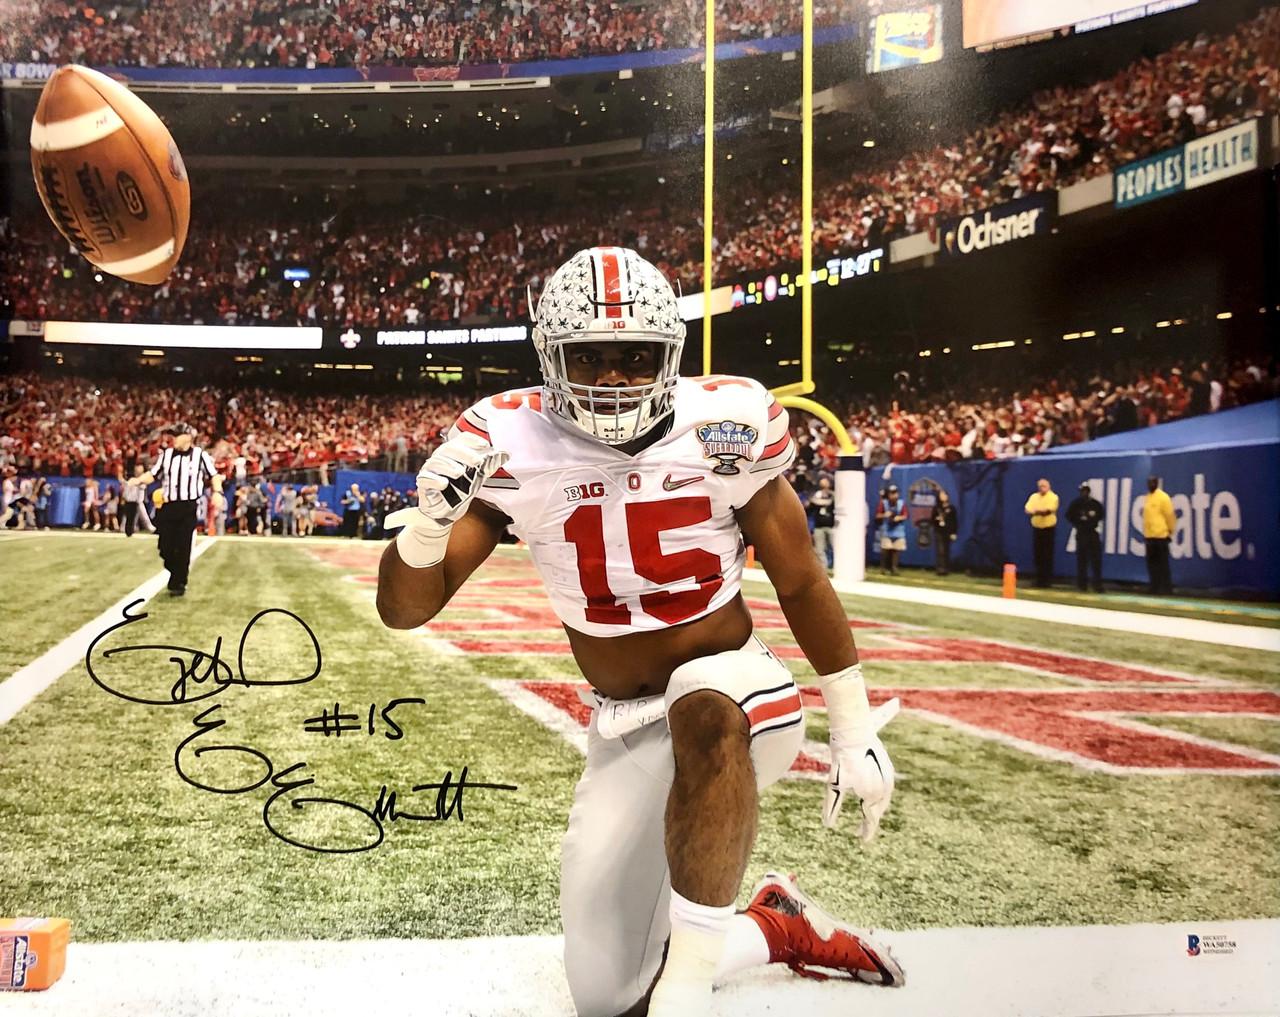 Ezekiel Elliott Ohio State Buckeyes 16-1 16x20 Autographed Photo - Beckett Authentic